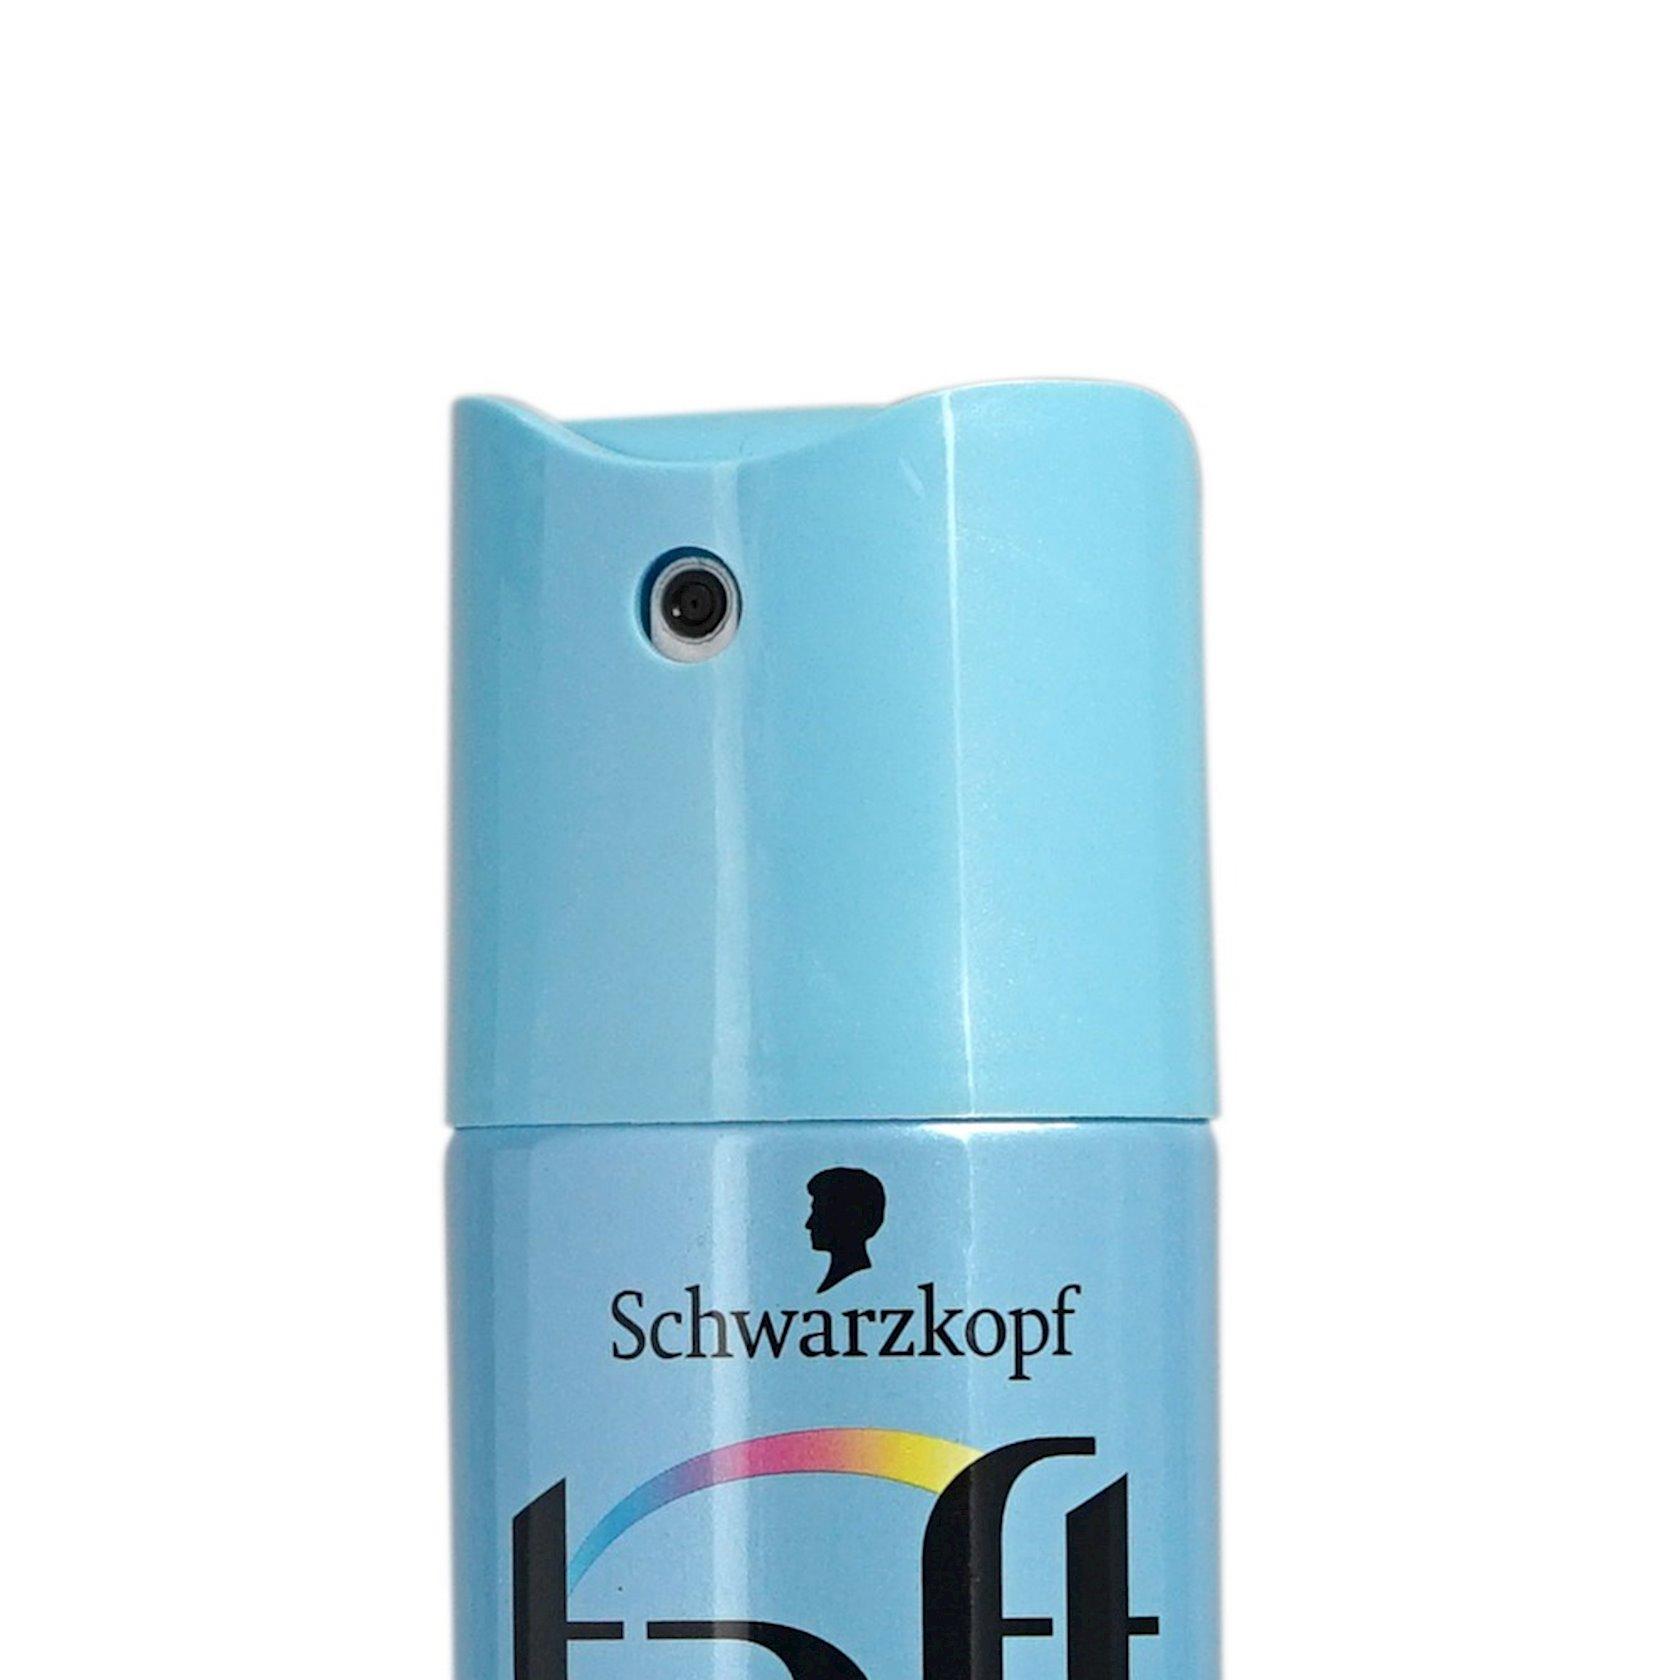 Saç lakı Taft Ultra Pure Supergüclü fiksasiya 225 ml